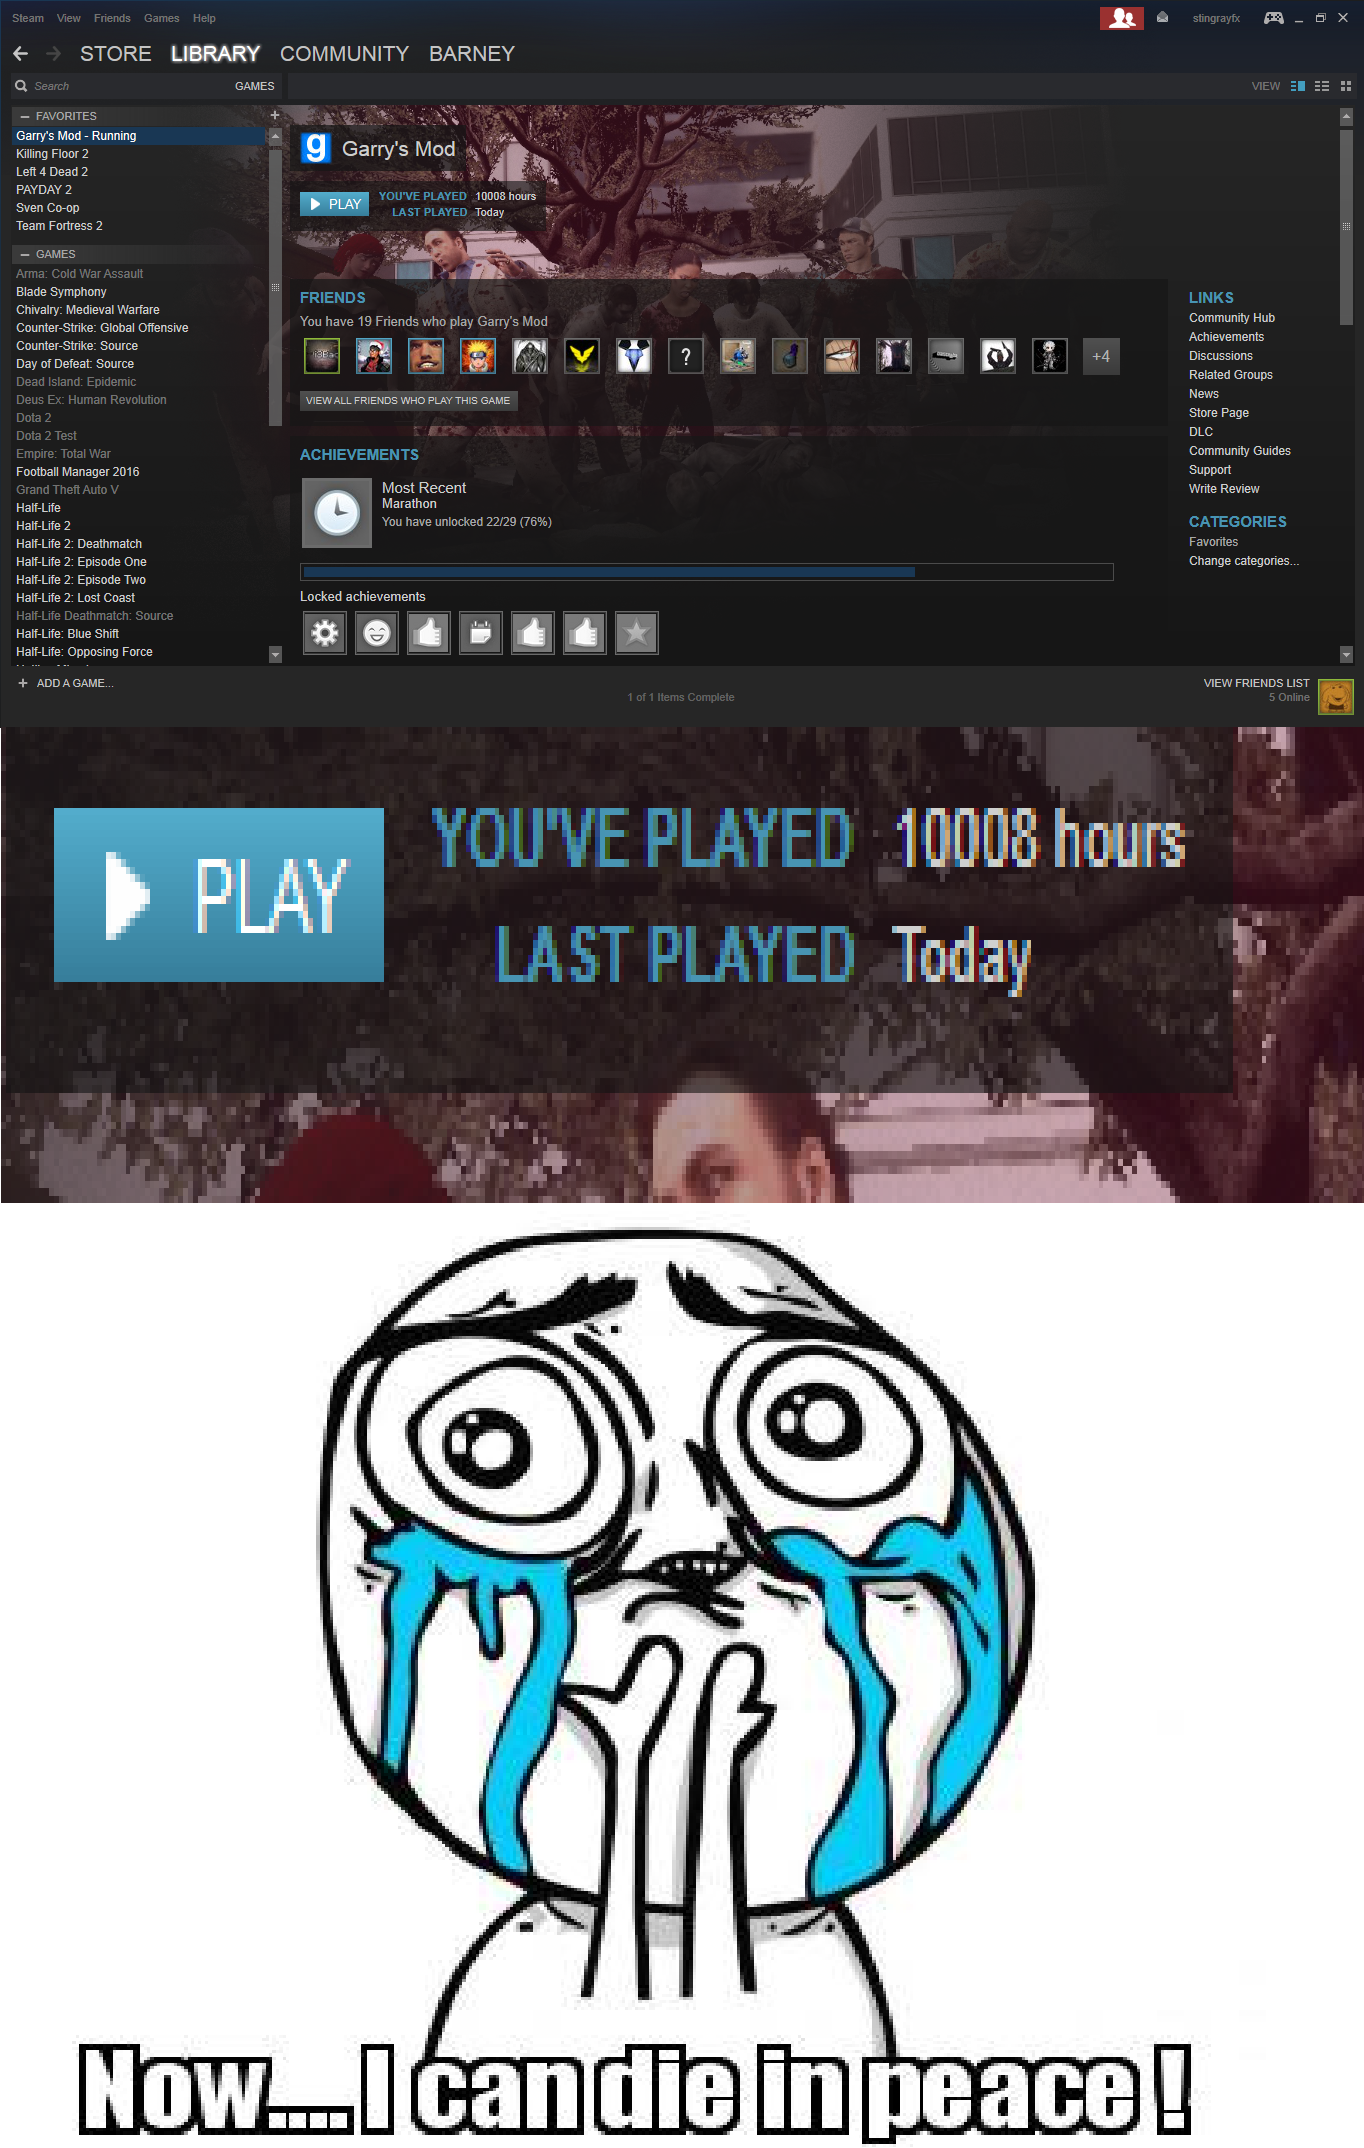 10,000 hours of Garry's Mod by IBRXGmod on DeviantArt